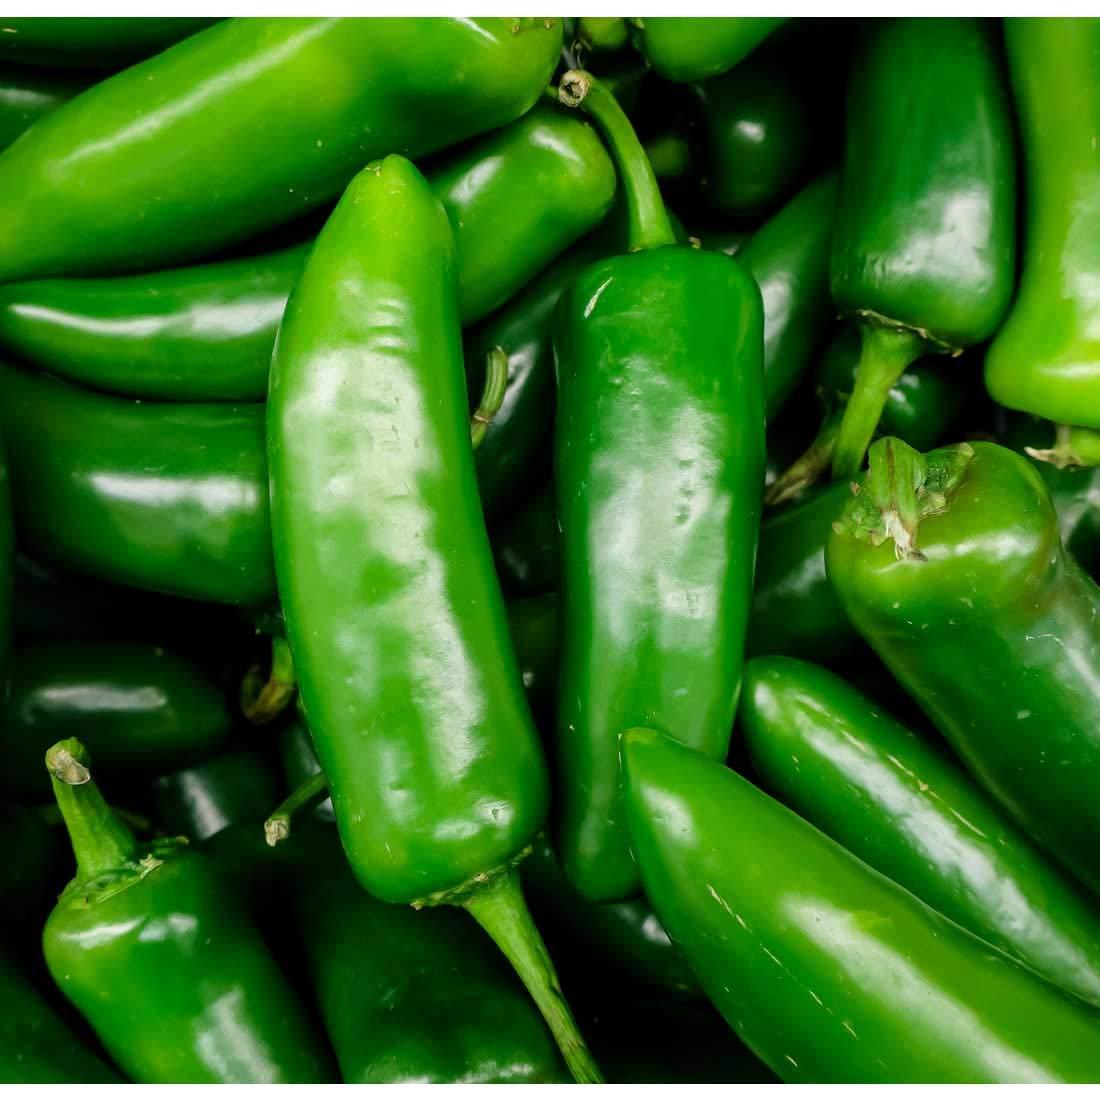 Large pile of green jalapenos.